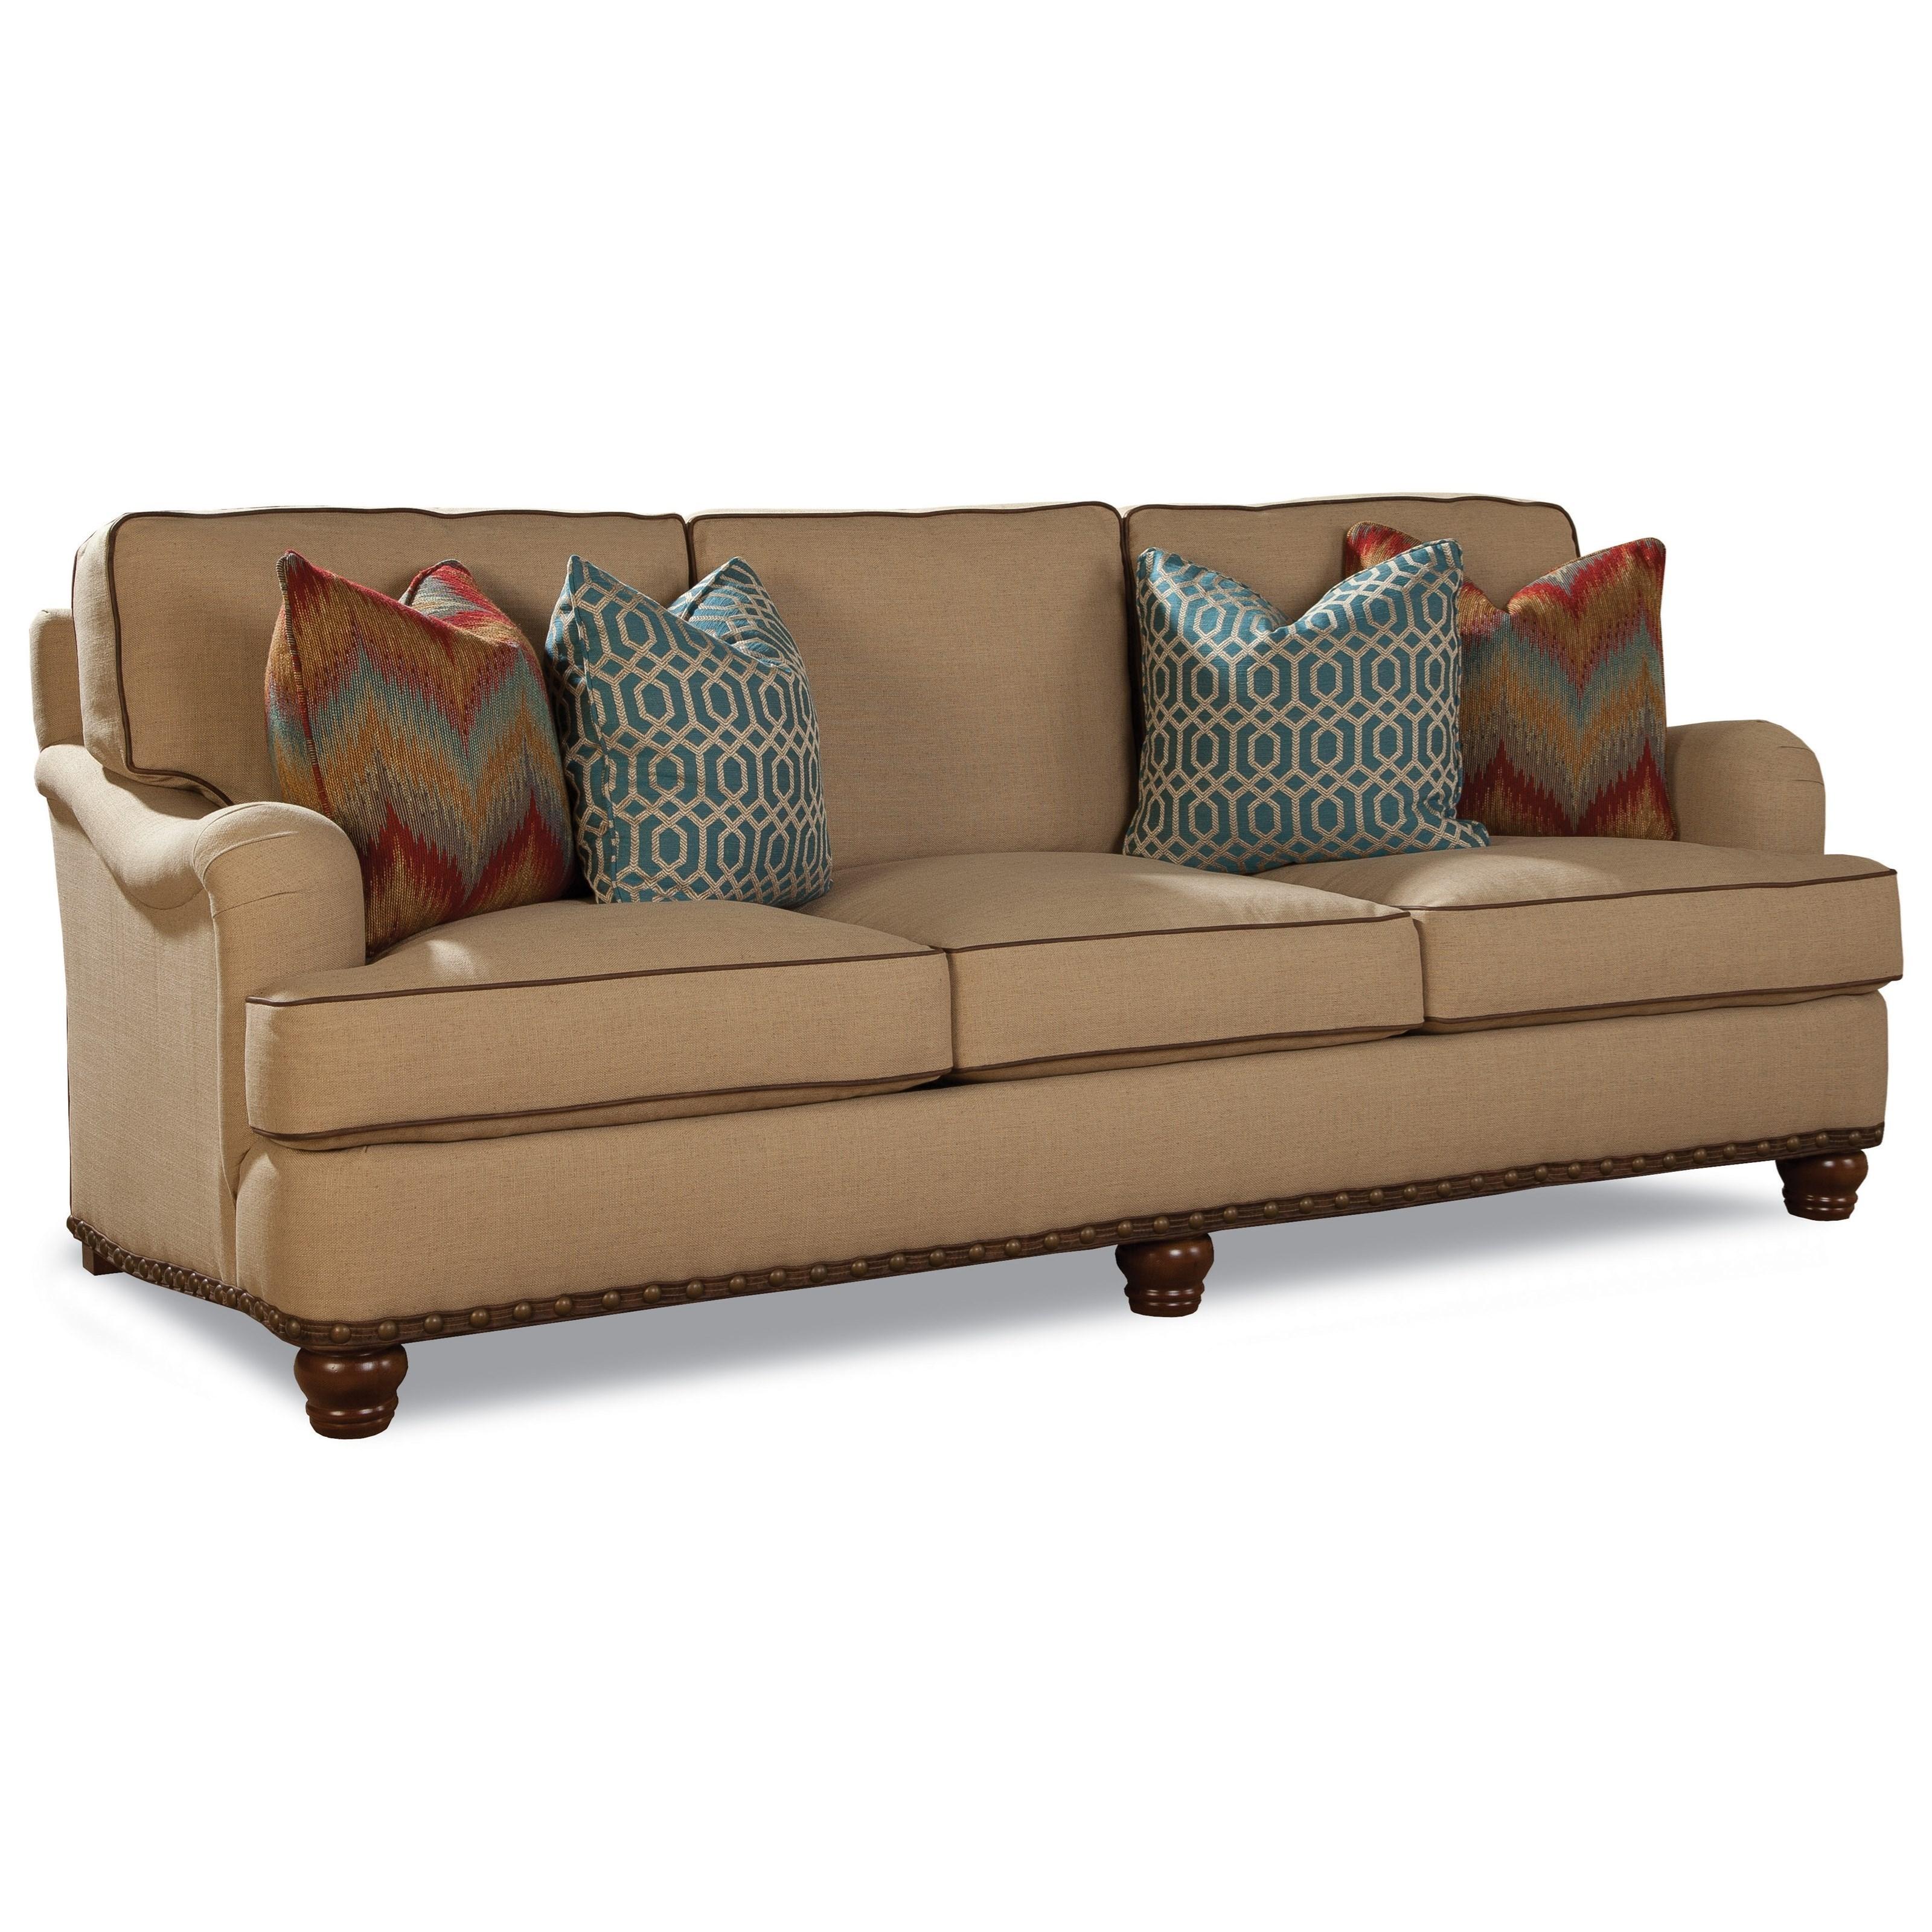 Huntington house 2071 customizable traditional sofa for Wayside furniture